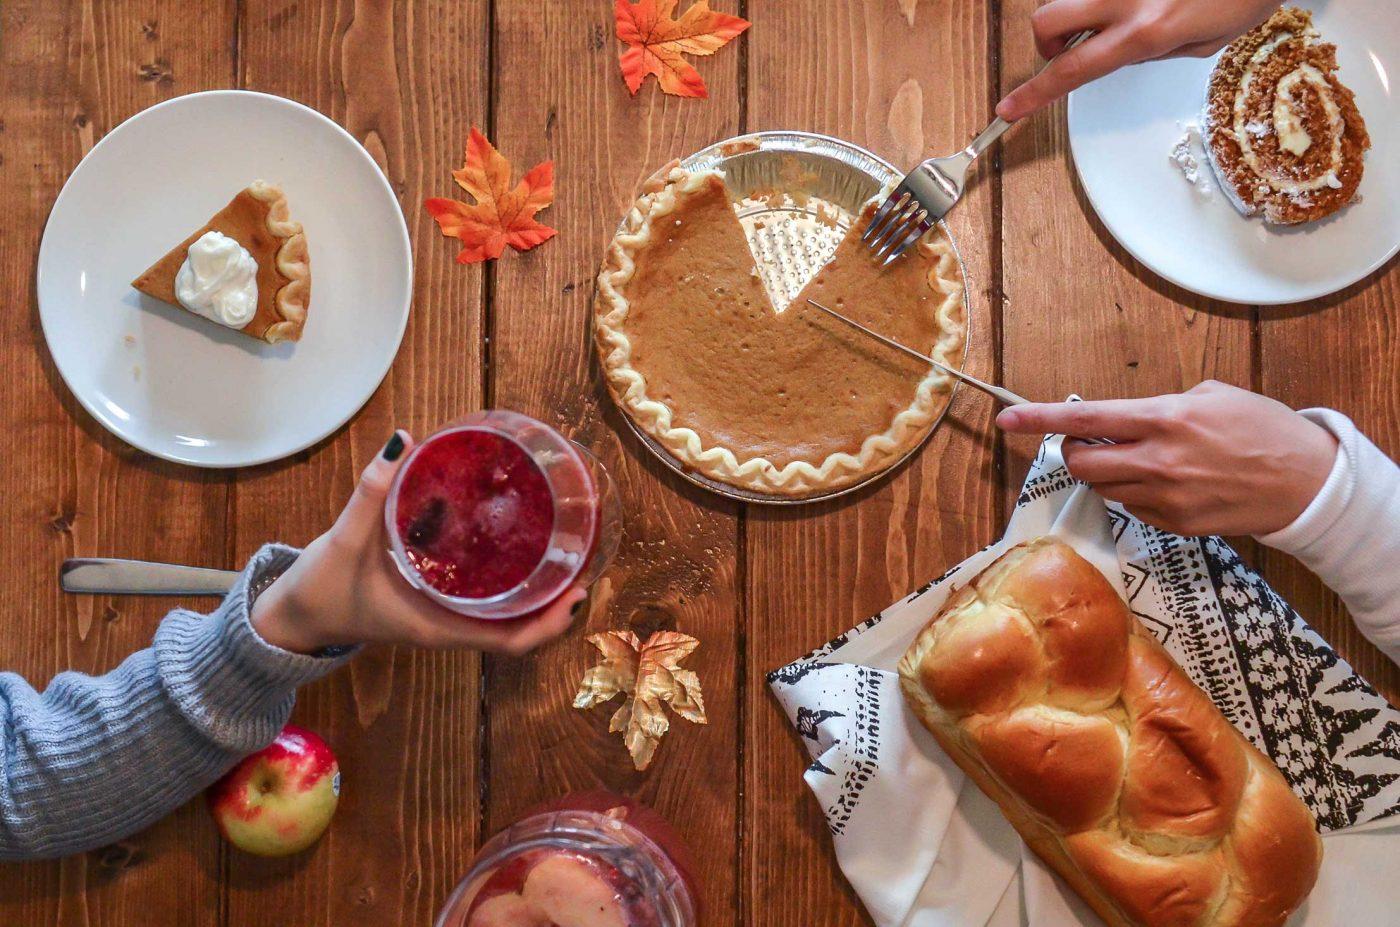 Celebrating Thanksgiving in 2020